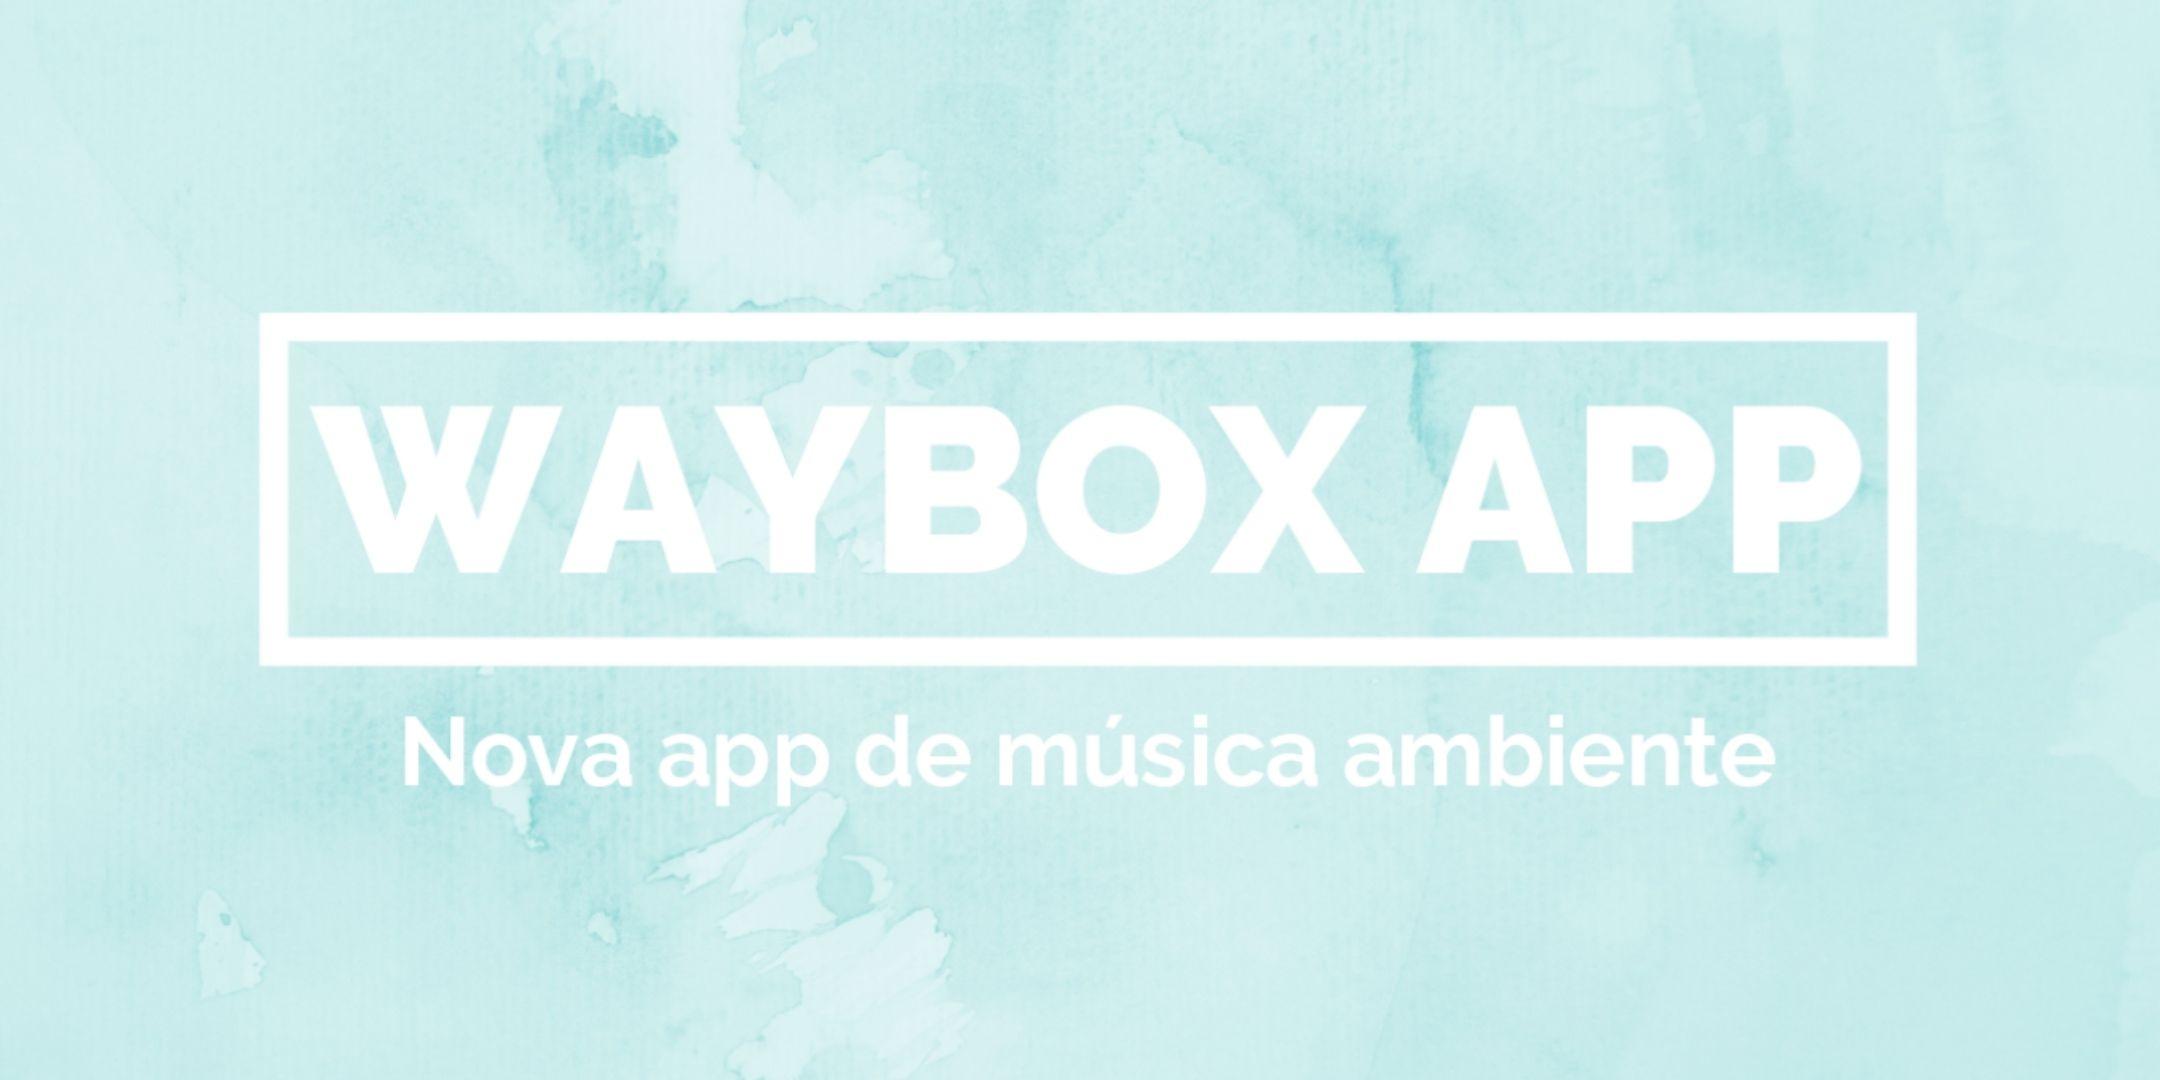 Waybox APP